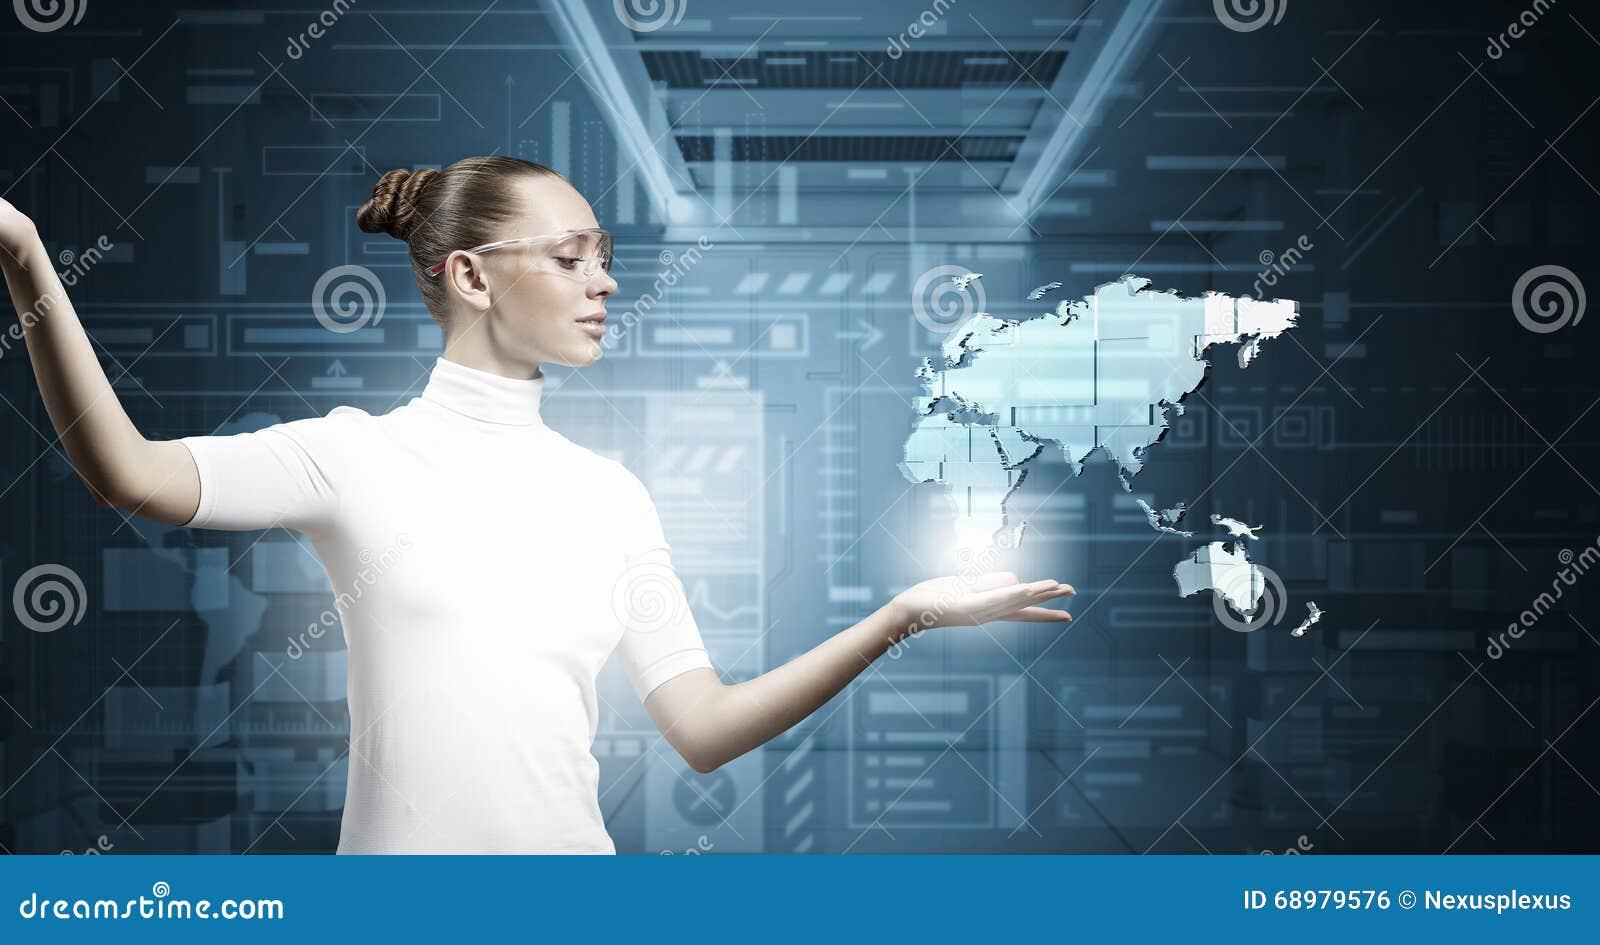 Medias tecnologías innovadoras